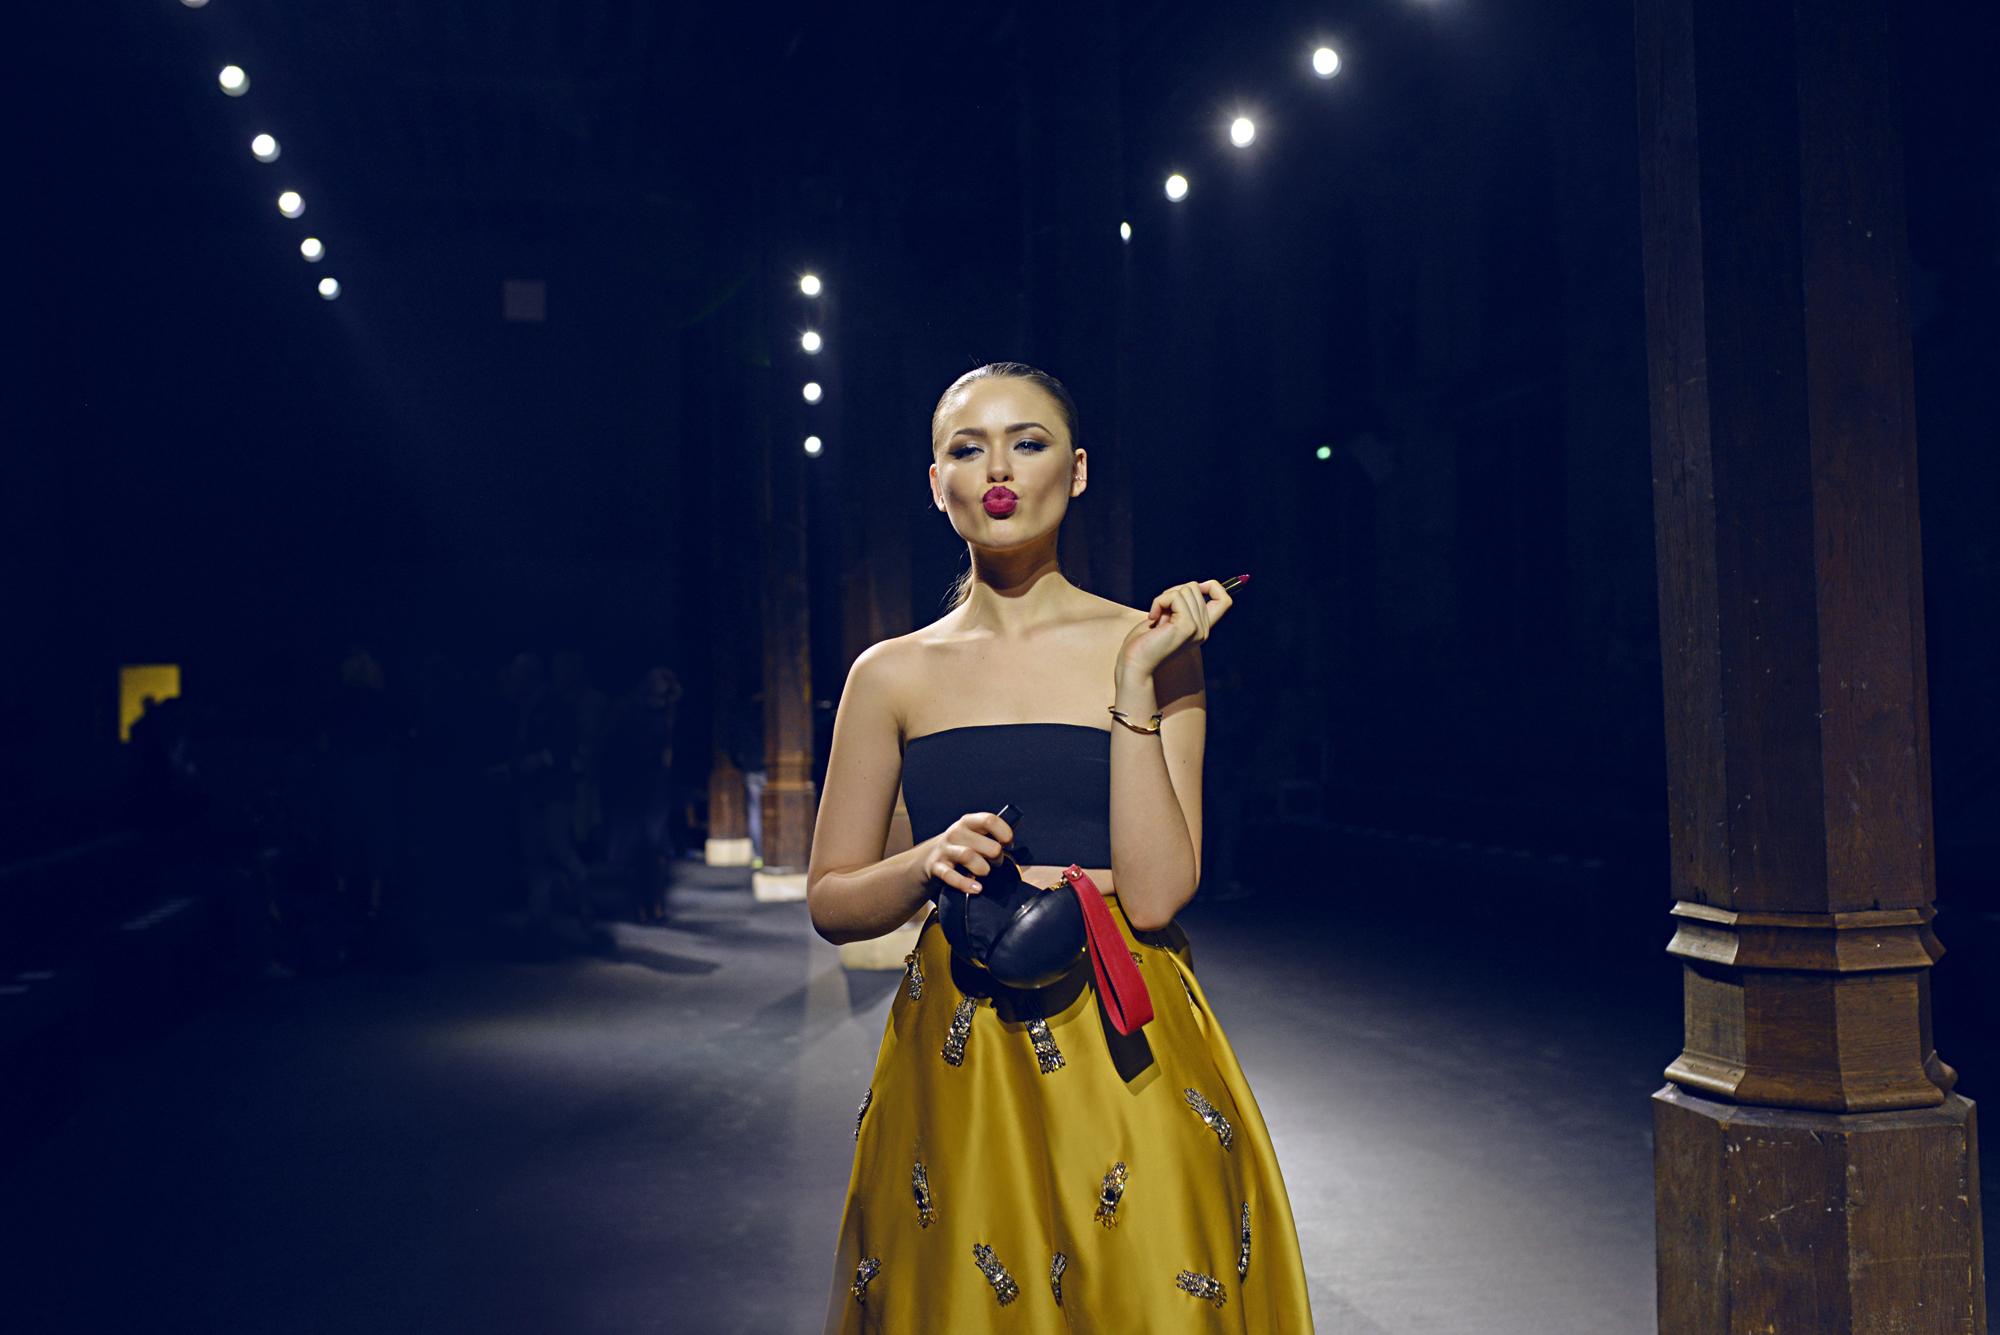 Cibelle x Kristina | L'OrealStreet_19